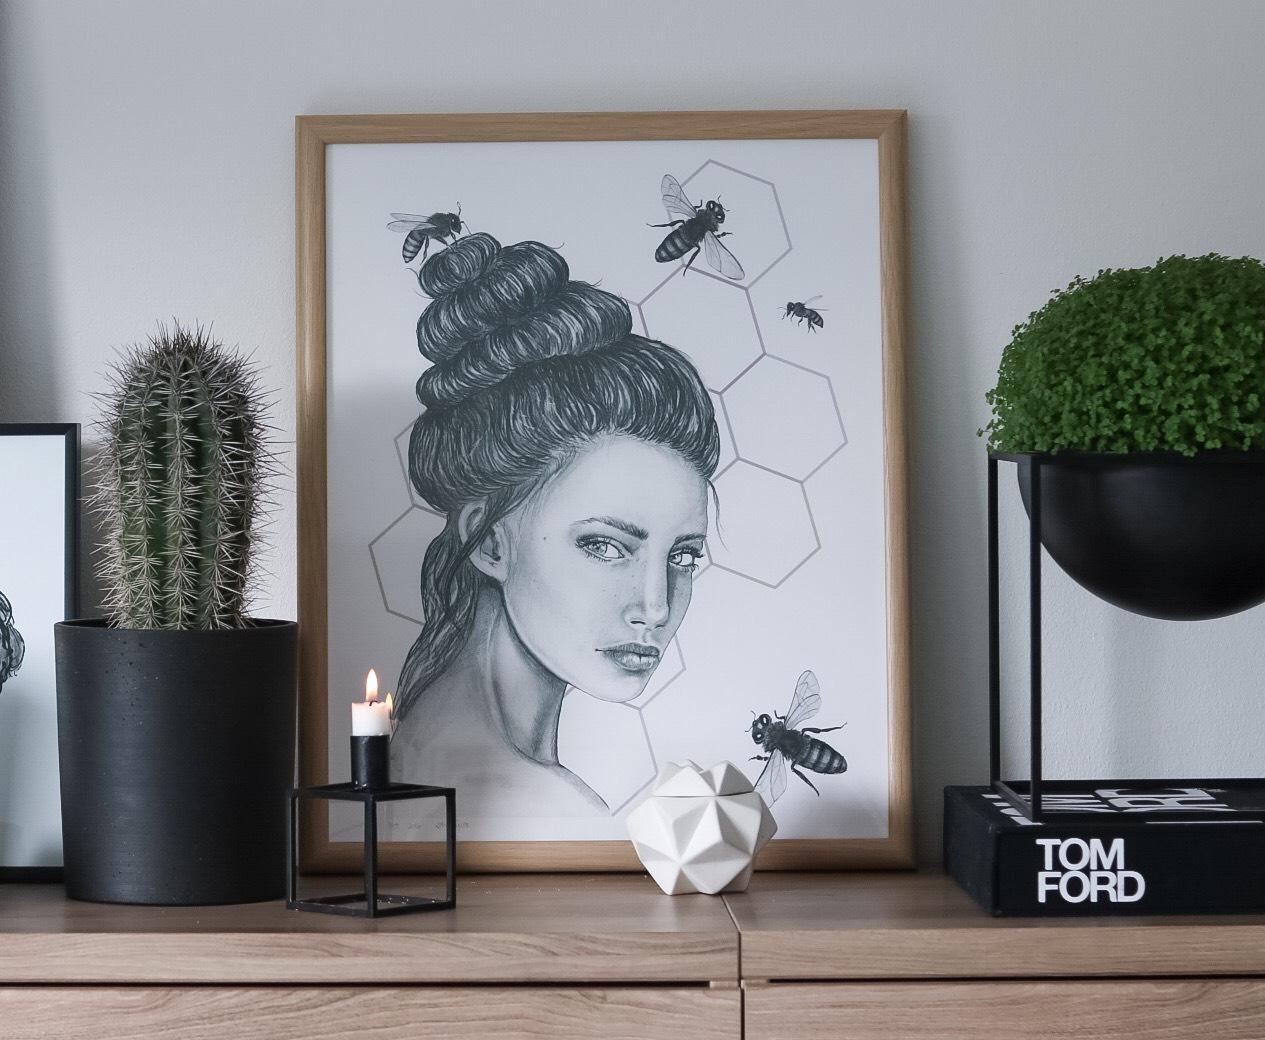 Come buzzing me (poster fra Glimre design)